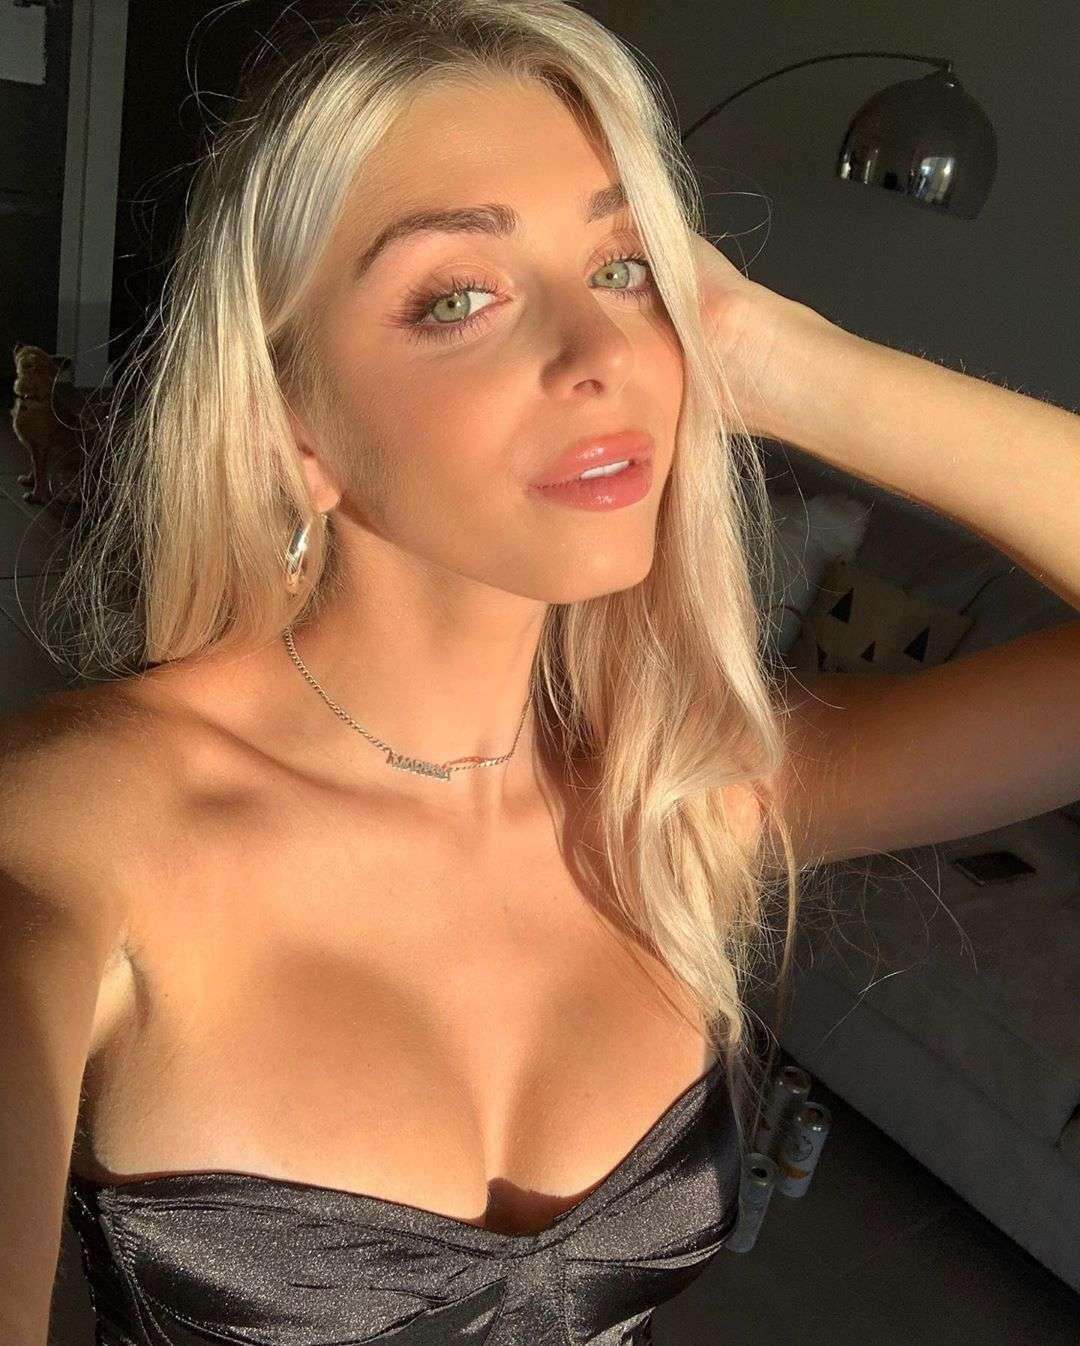 Marissa Eve nude & fit | FitNakedGirls.com